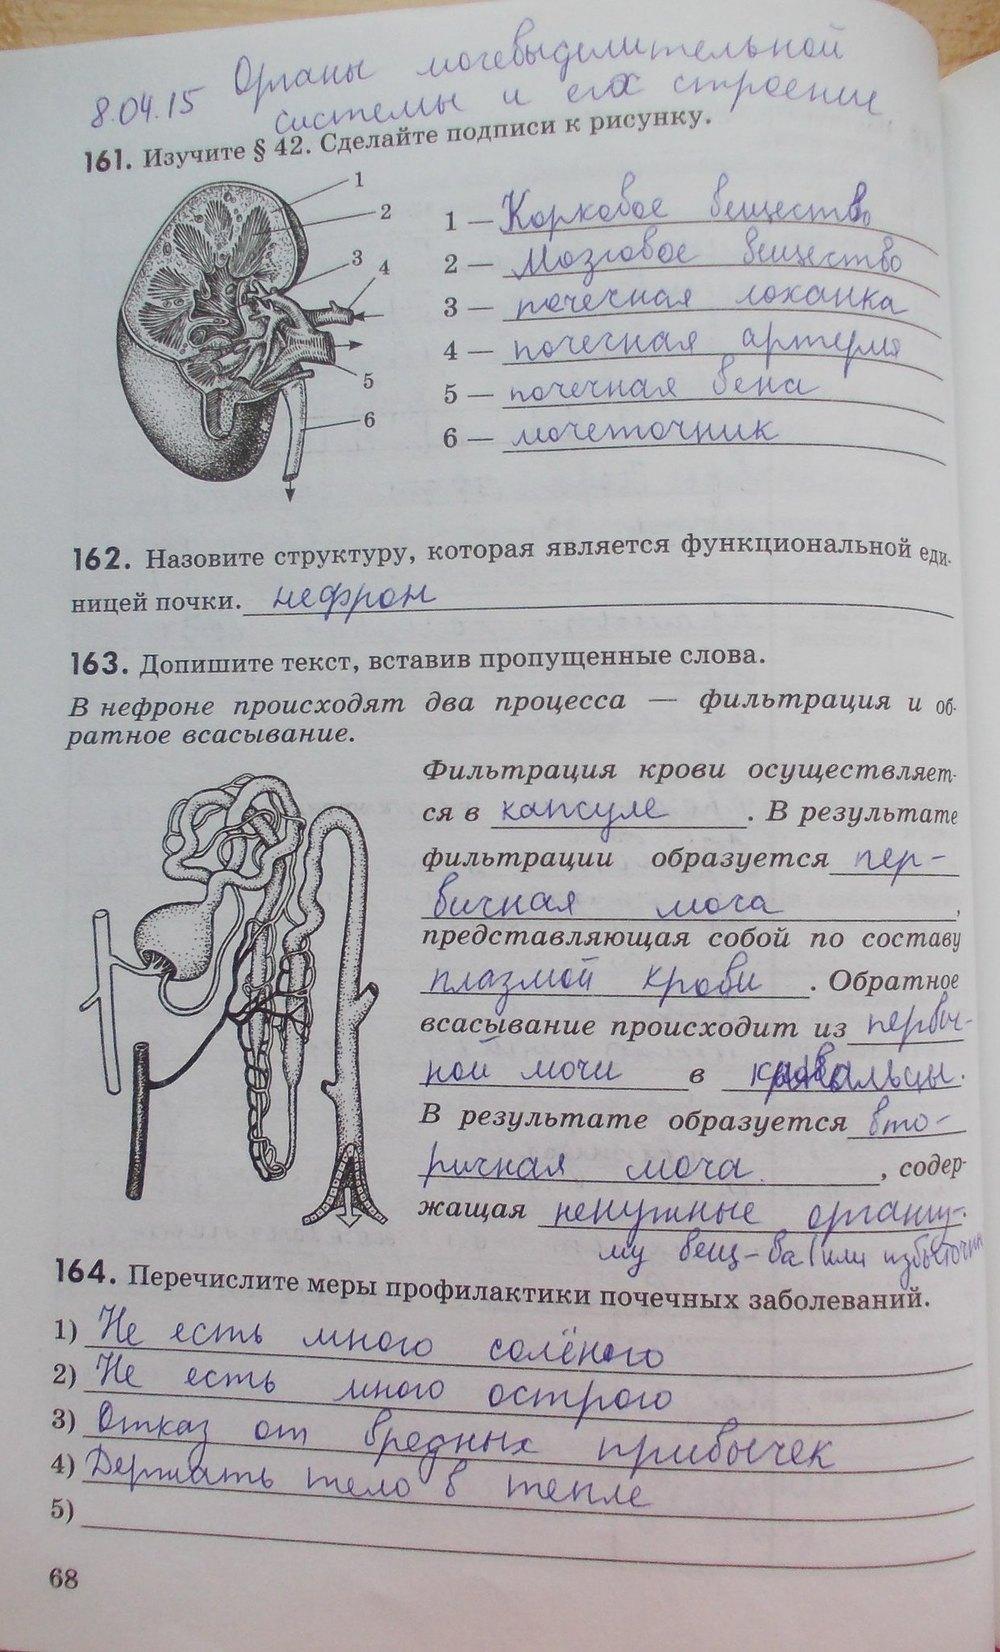 Биология Колесов Решебник И Гдз